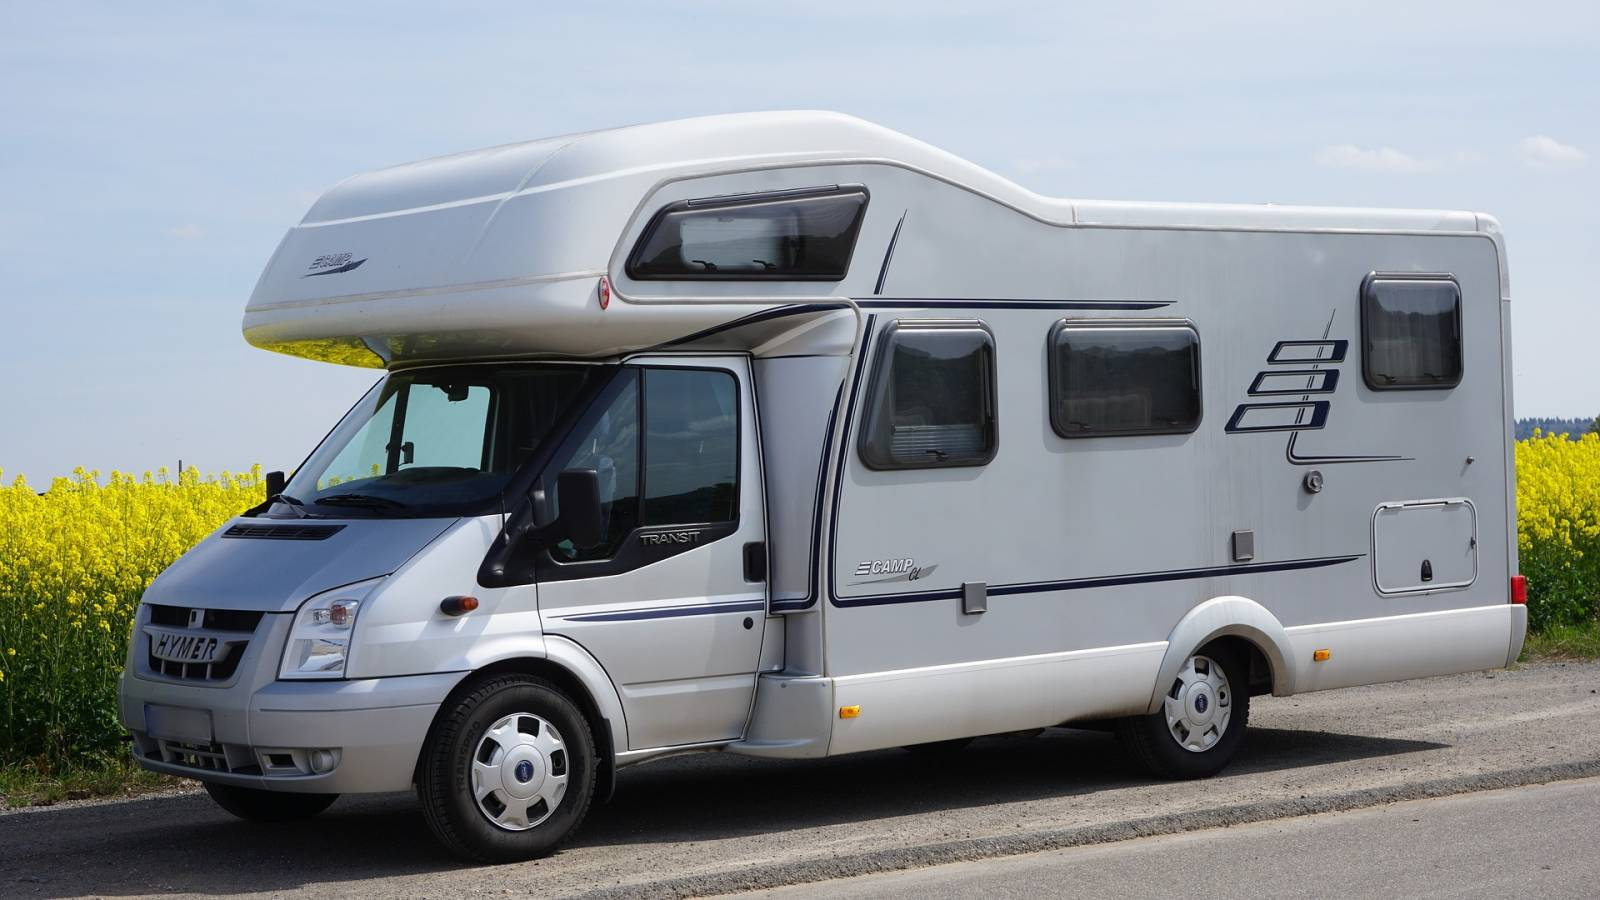 avocat vice cach camping car montpellier et b ziers montpellier les avocats du th l me. Black Bedroom Furniture Sets. Home Design Ideas